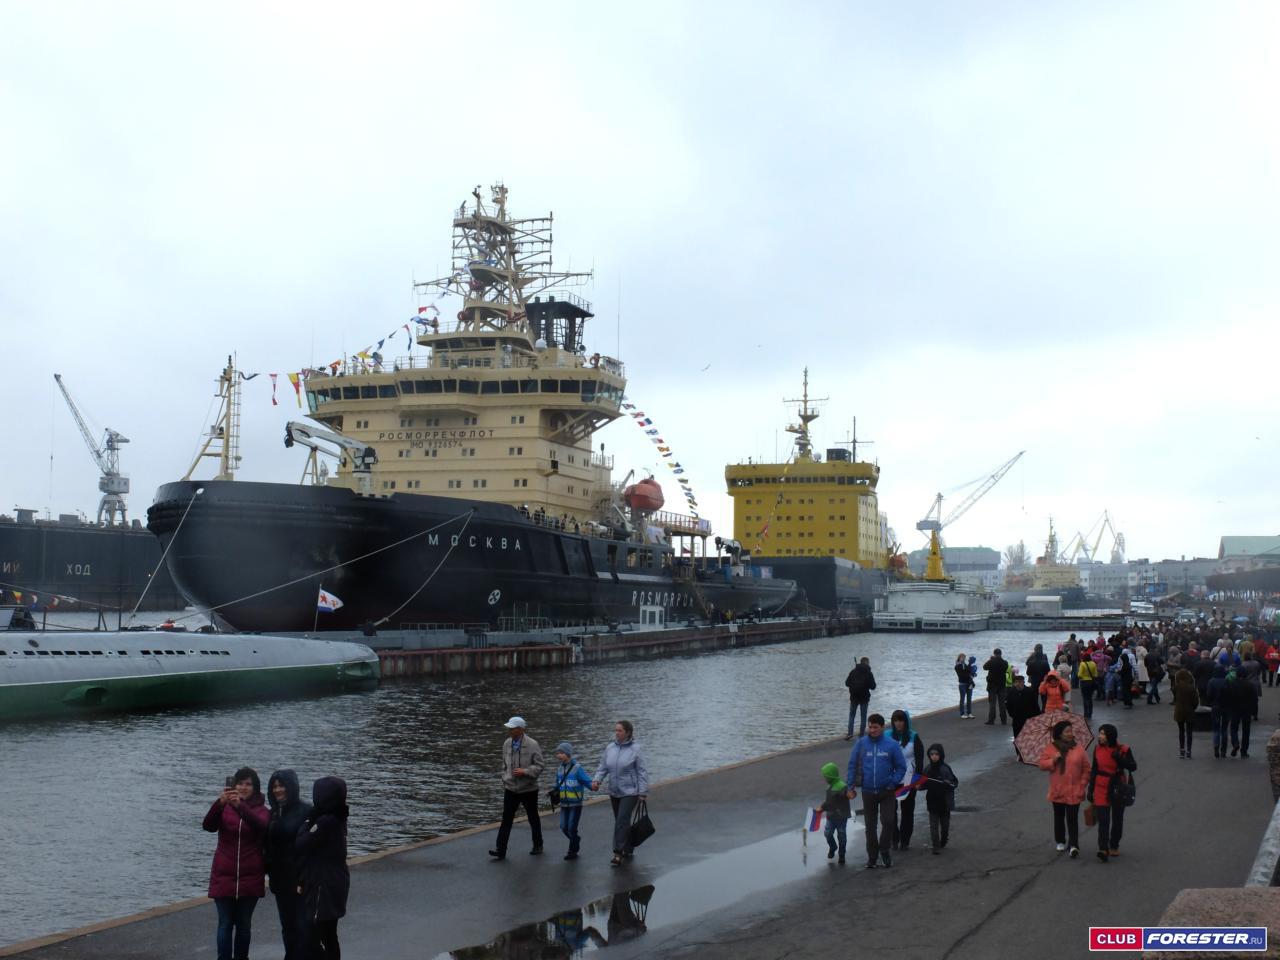 ледокол Москва.jpg